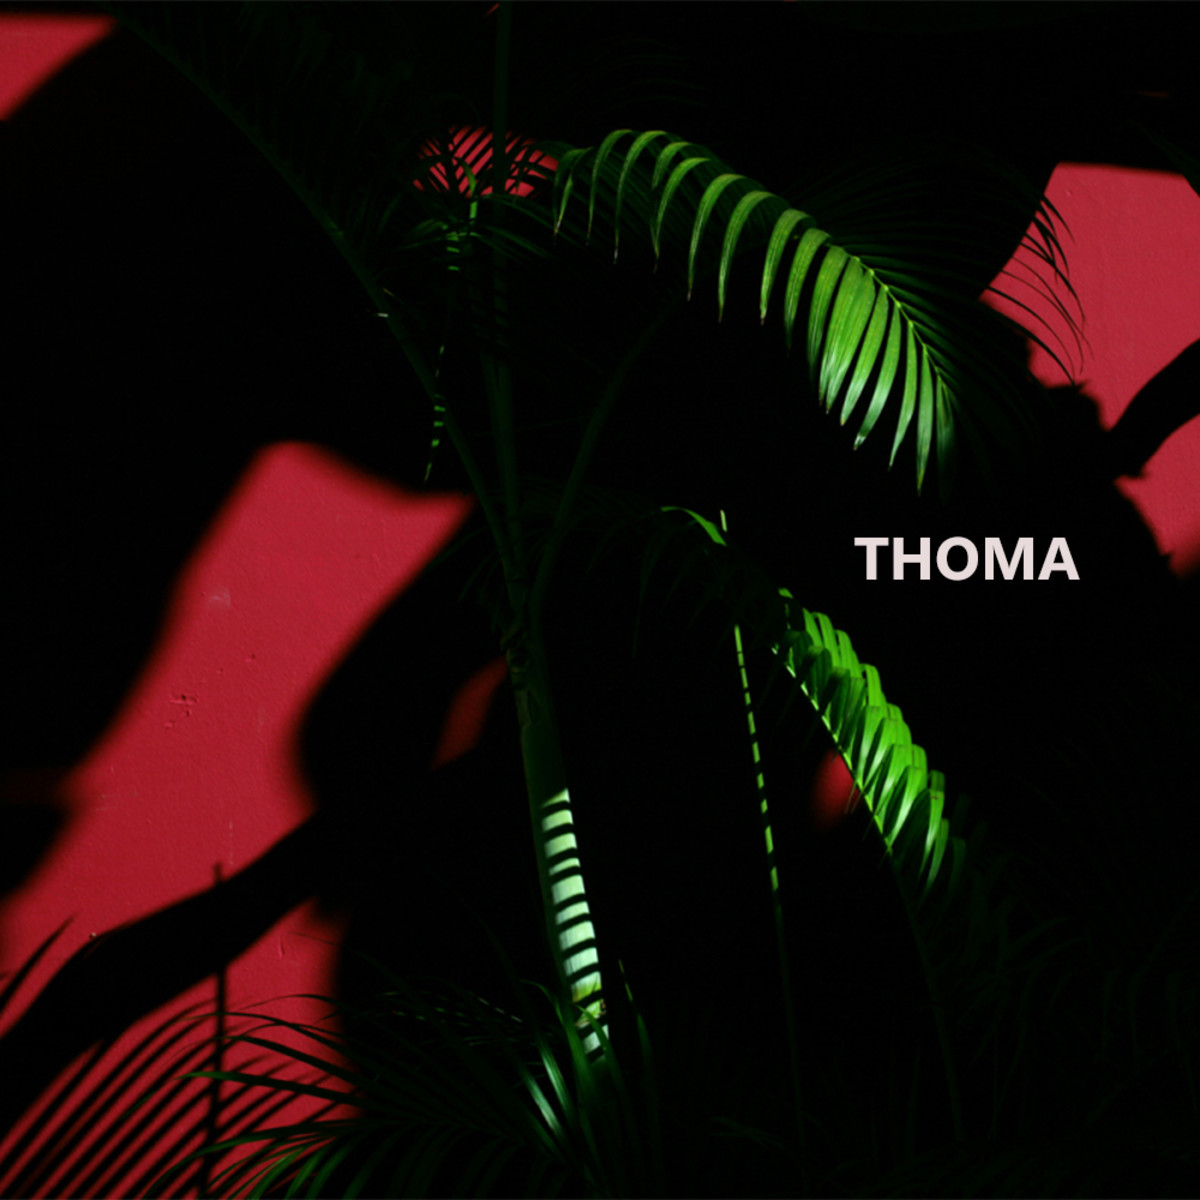 thoma album w font.jpg